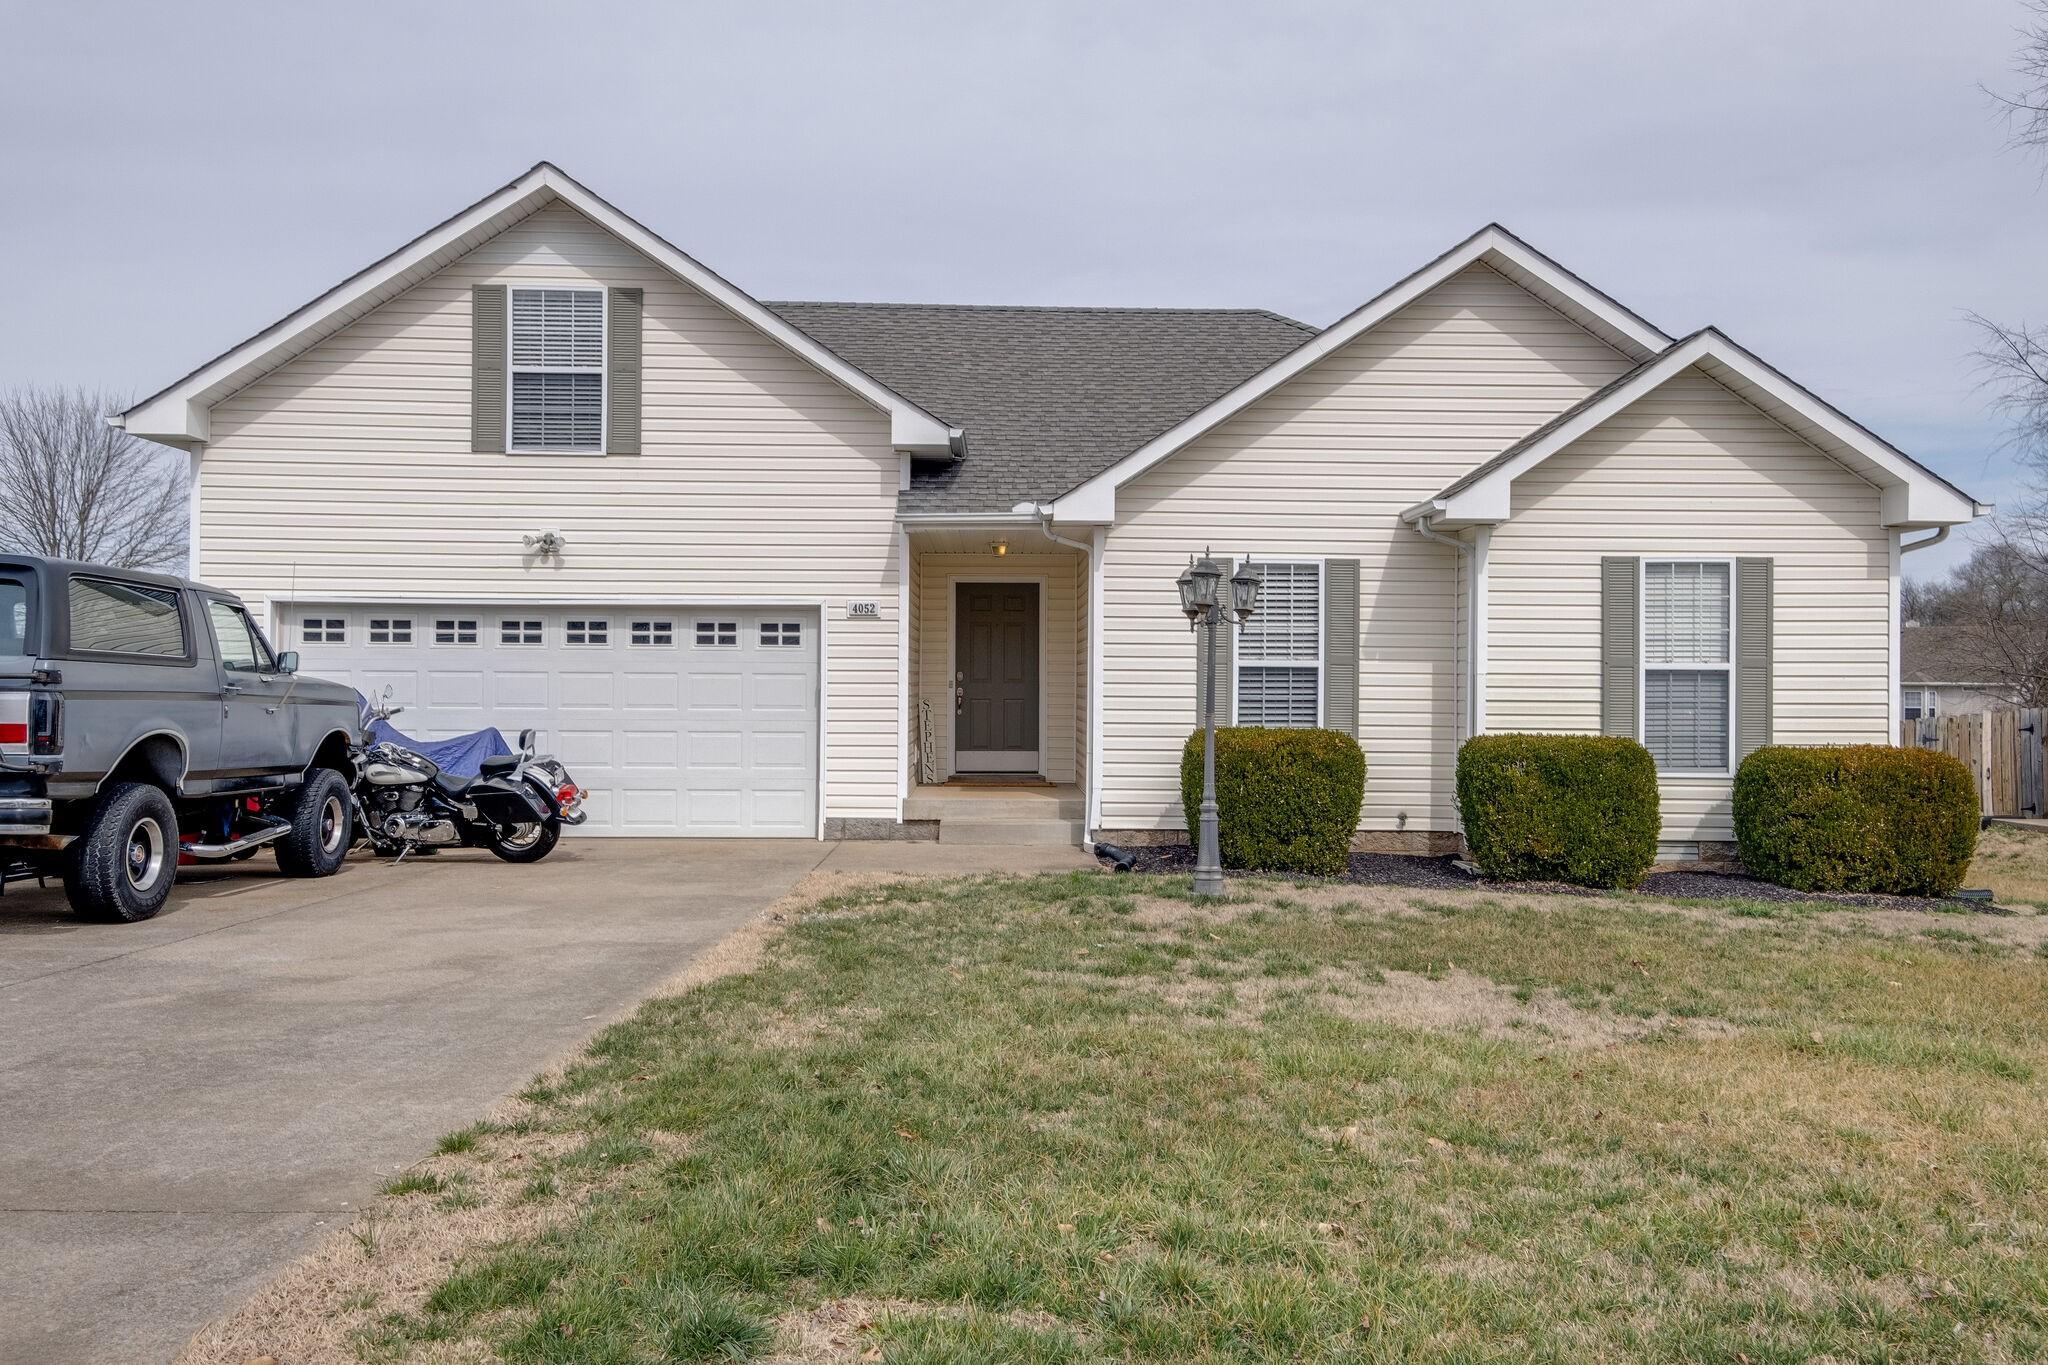 4052 New Grange Cir Property Photo - Clarksville, TN real estate listing